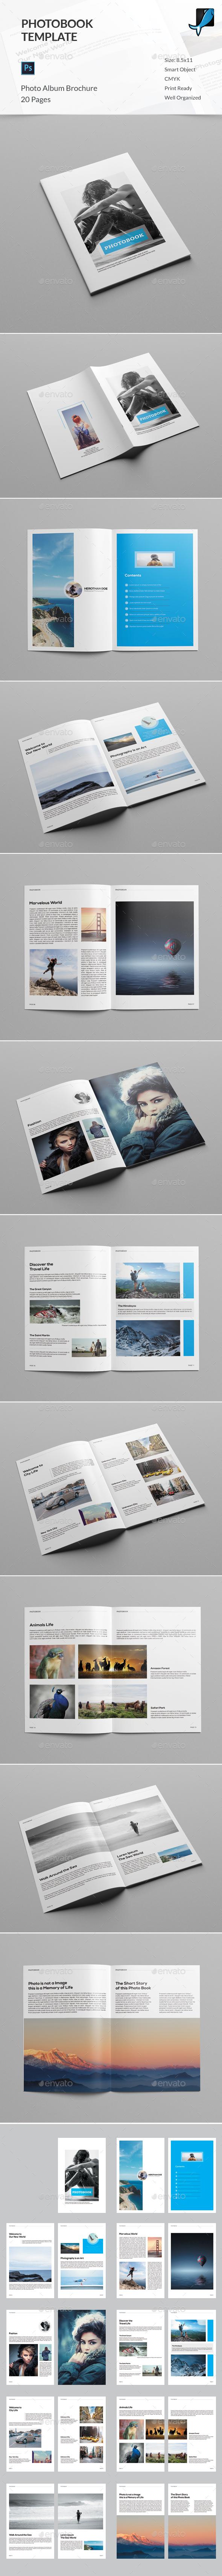 Photobook Template - Photo Albums Print Templates